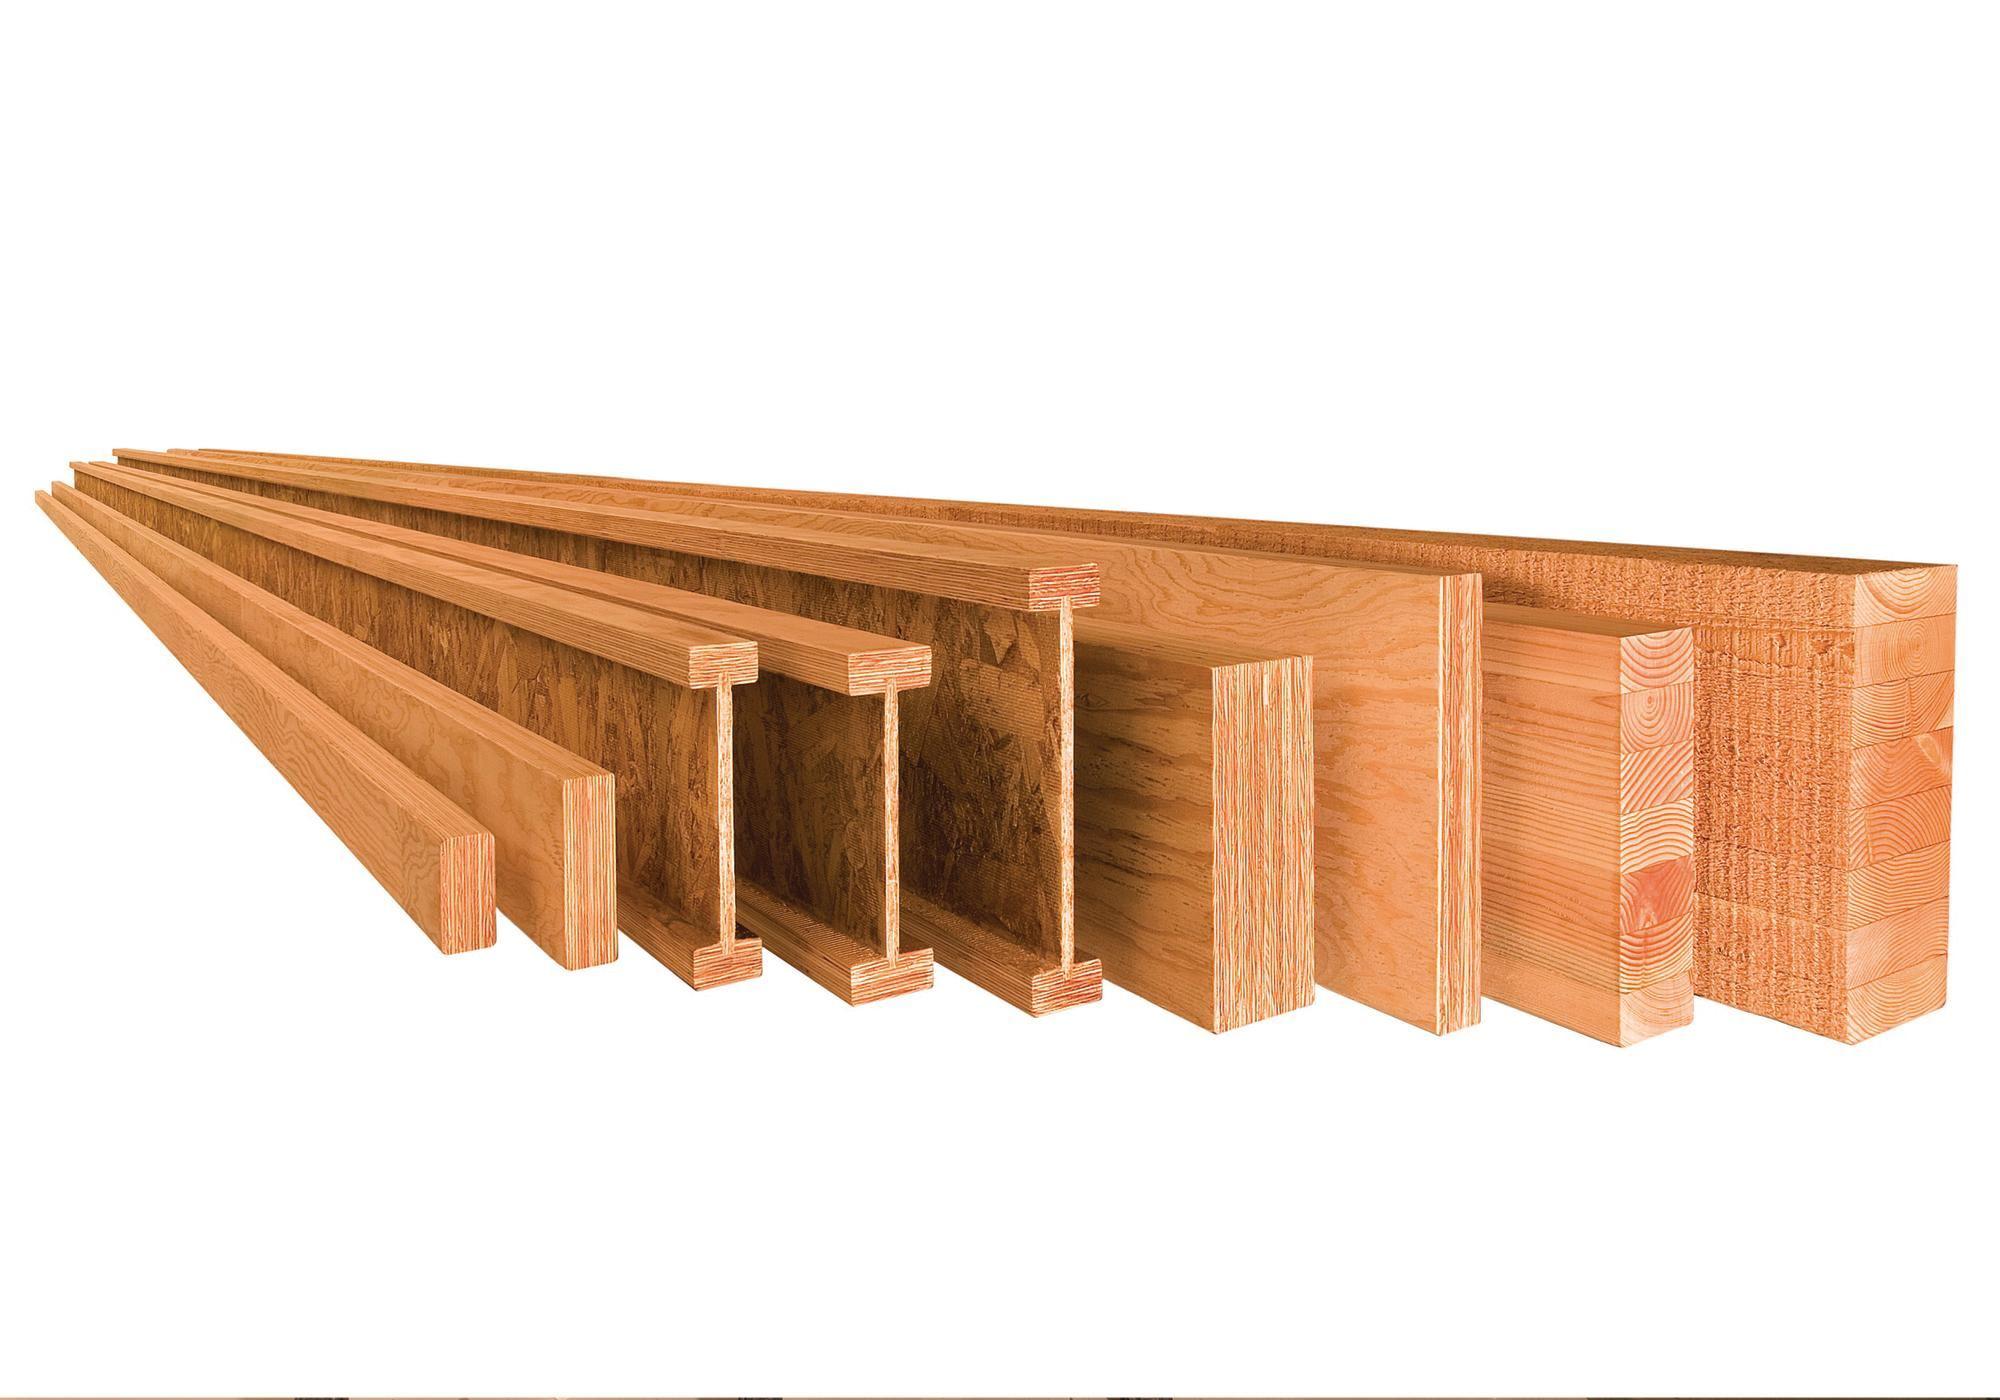 Fsc Certified Engineered Wood From Boise Cascade